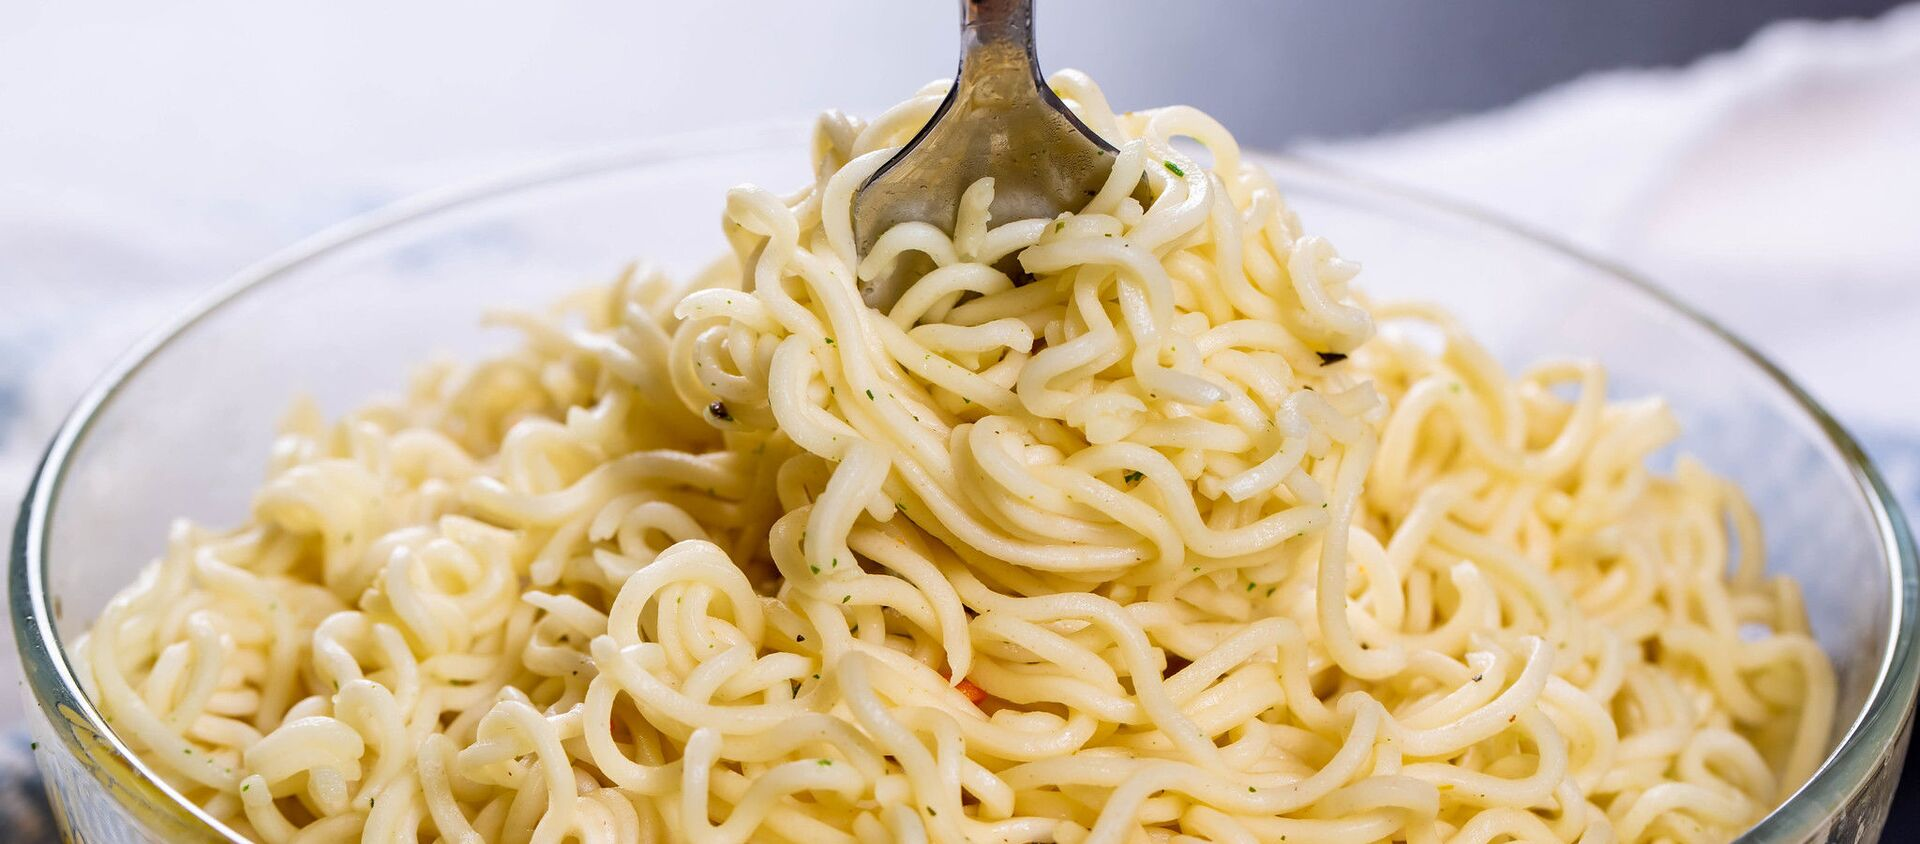 Món ăn mì - Sputnik Việt Nam, 1920, 30.08.2021